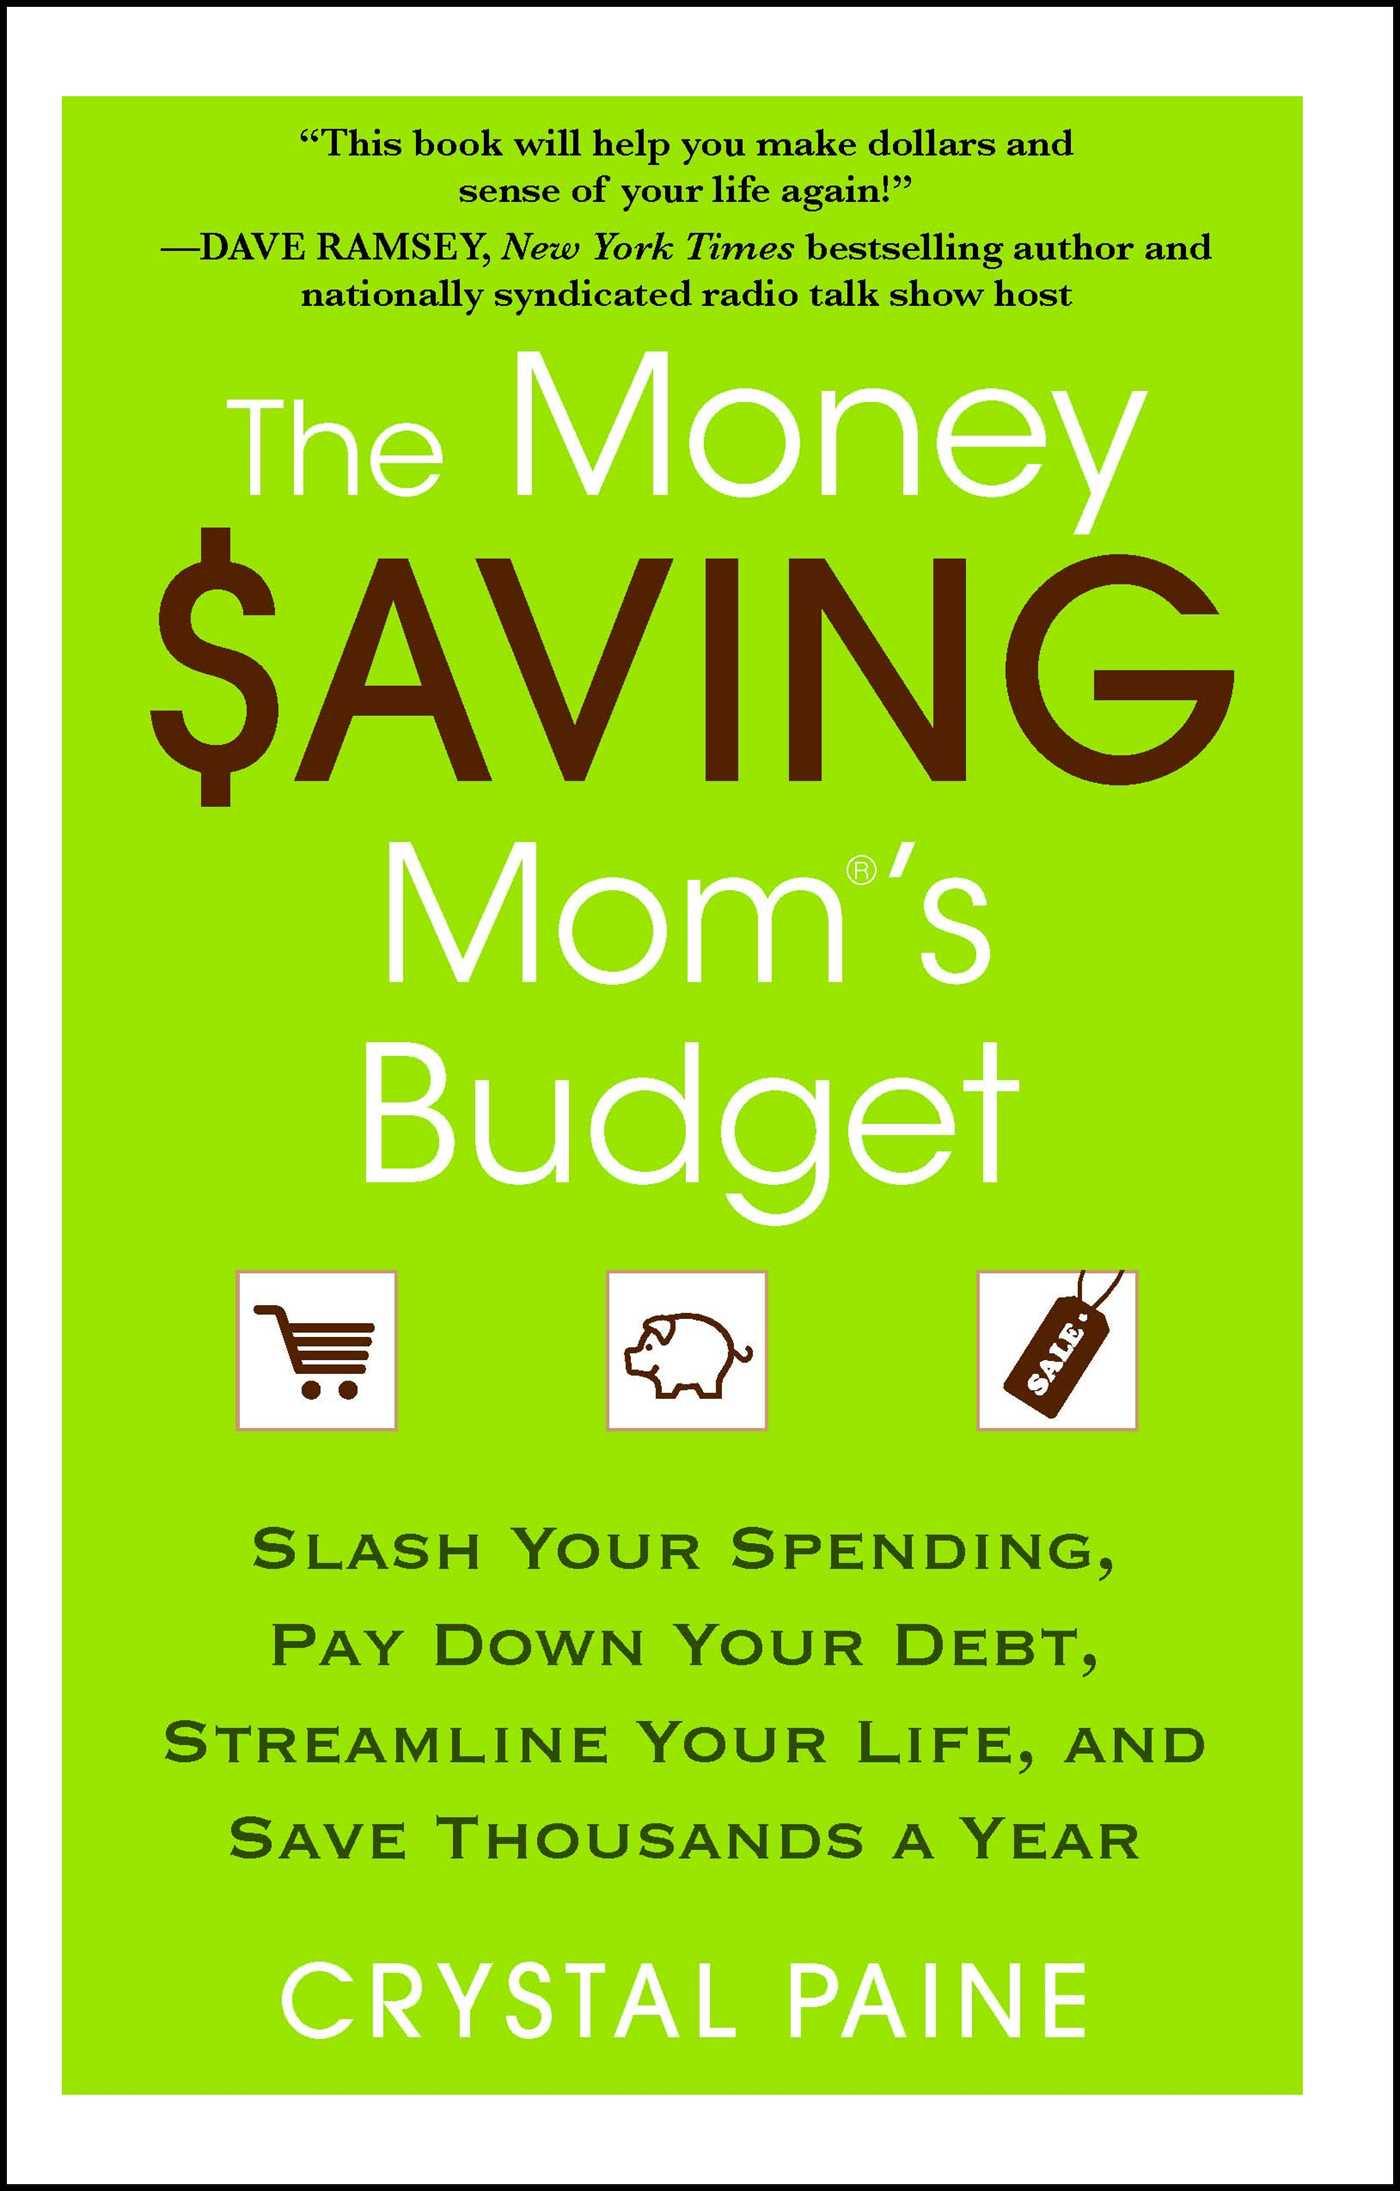 Money Savong Mom 53